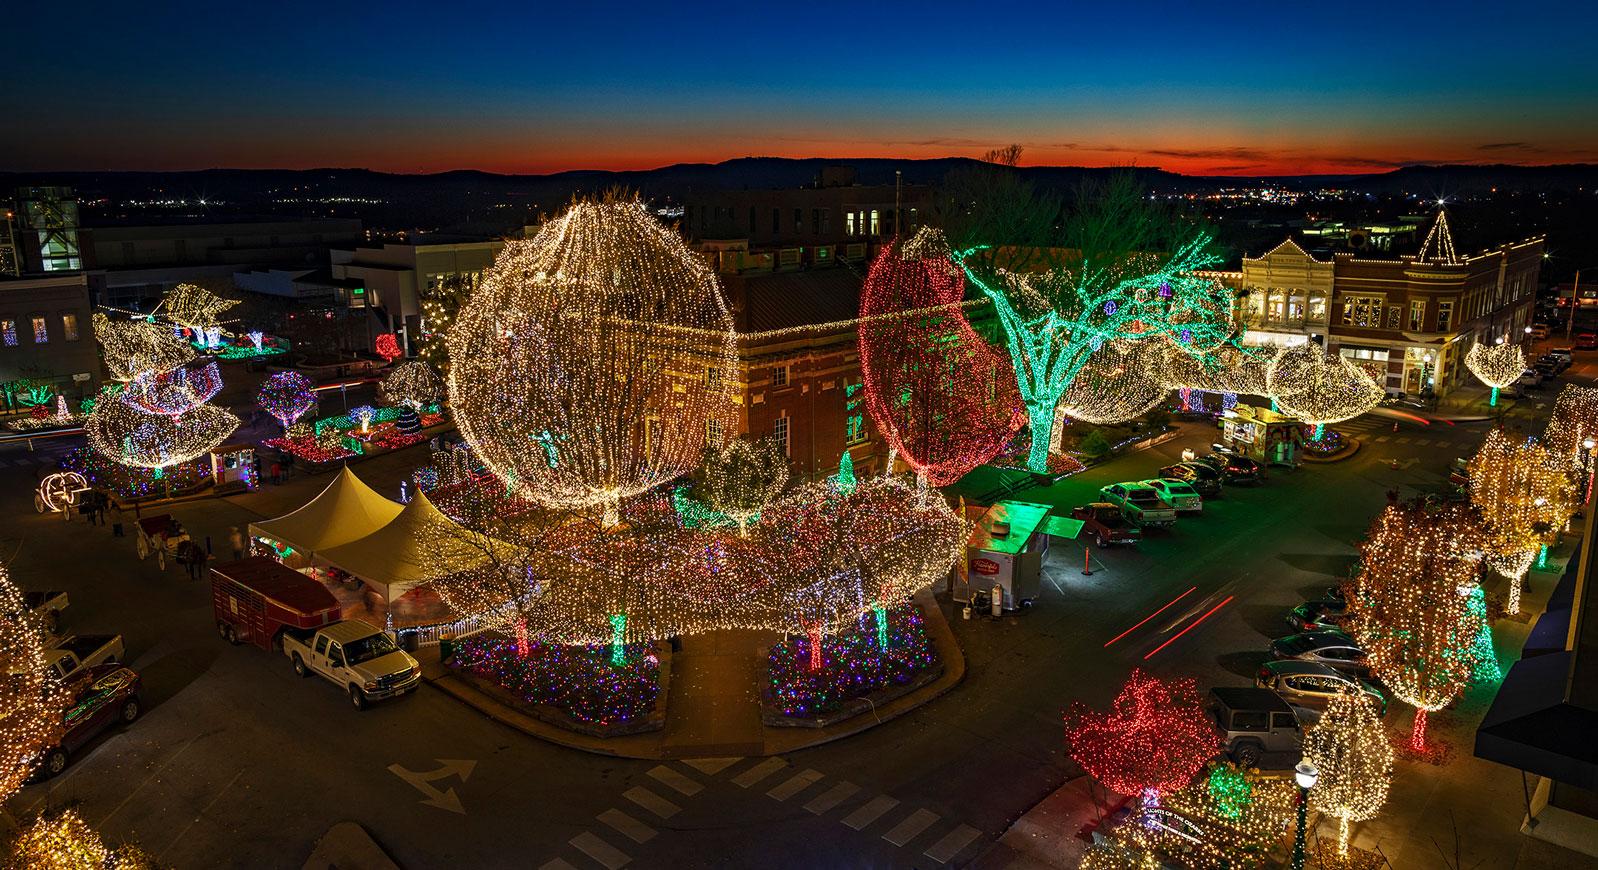 Lights-of-the-Ozarks-Fayetteville-Arkansas